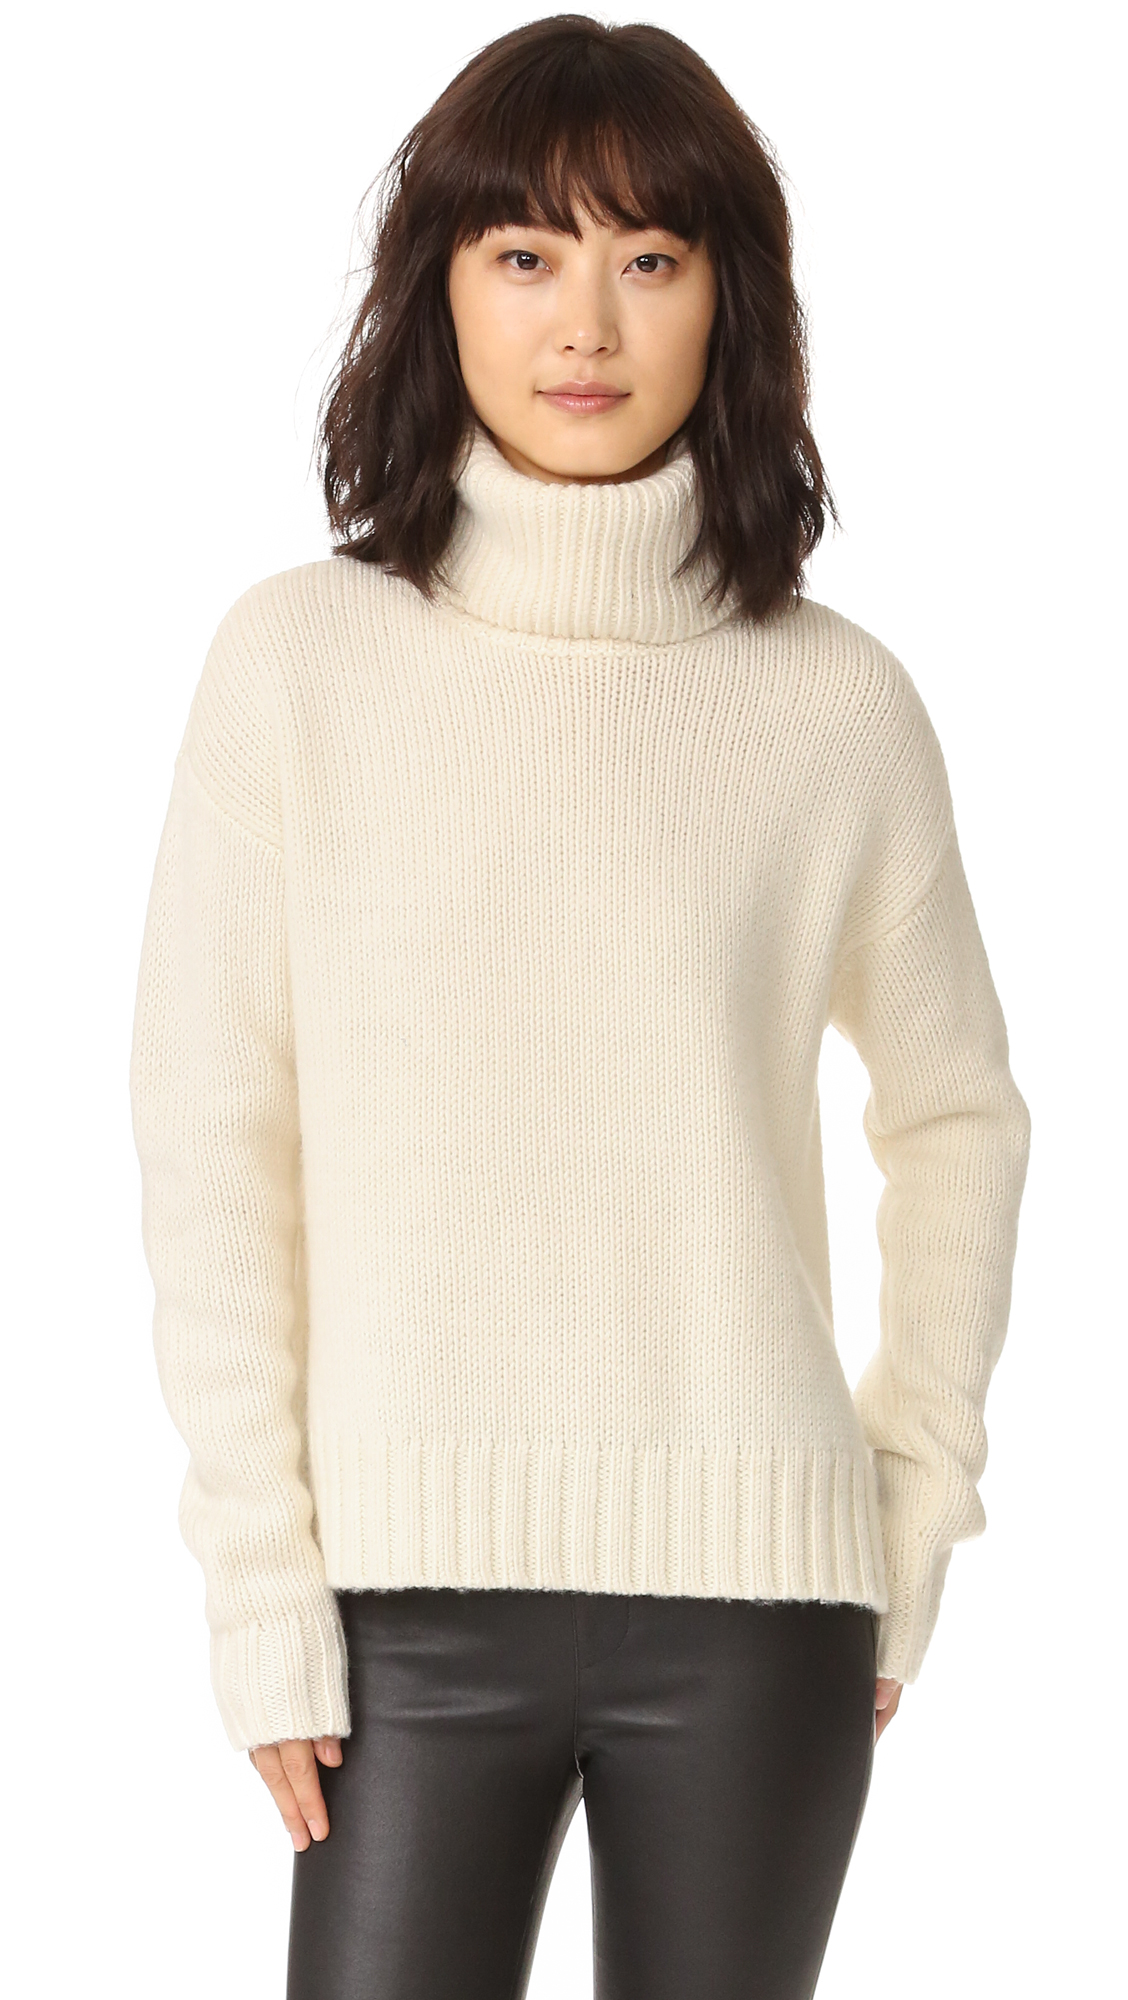 A.L.C. Jake Sweater - White at Shopbop